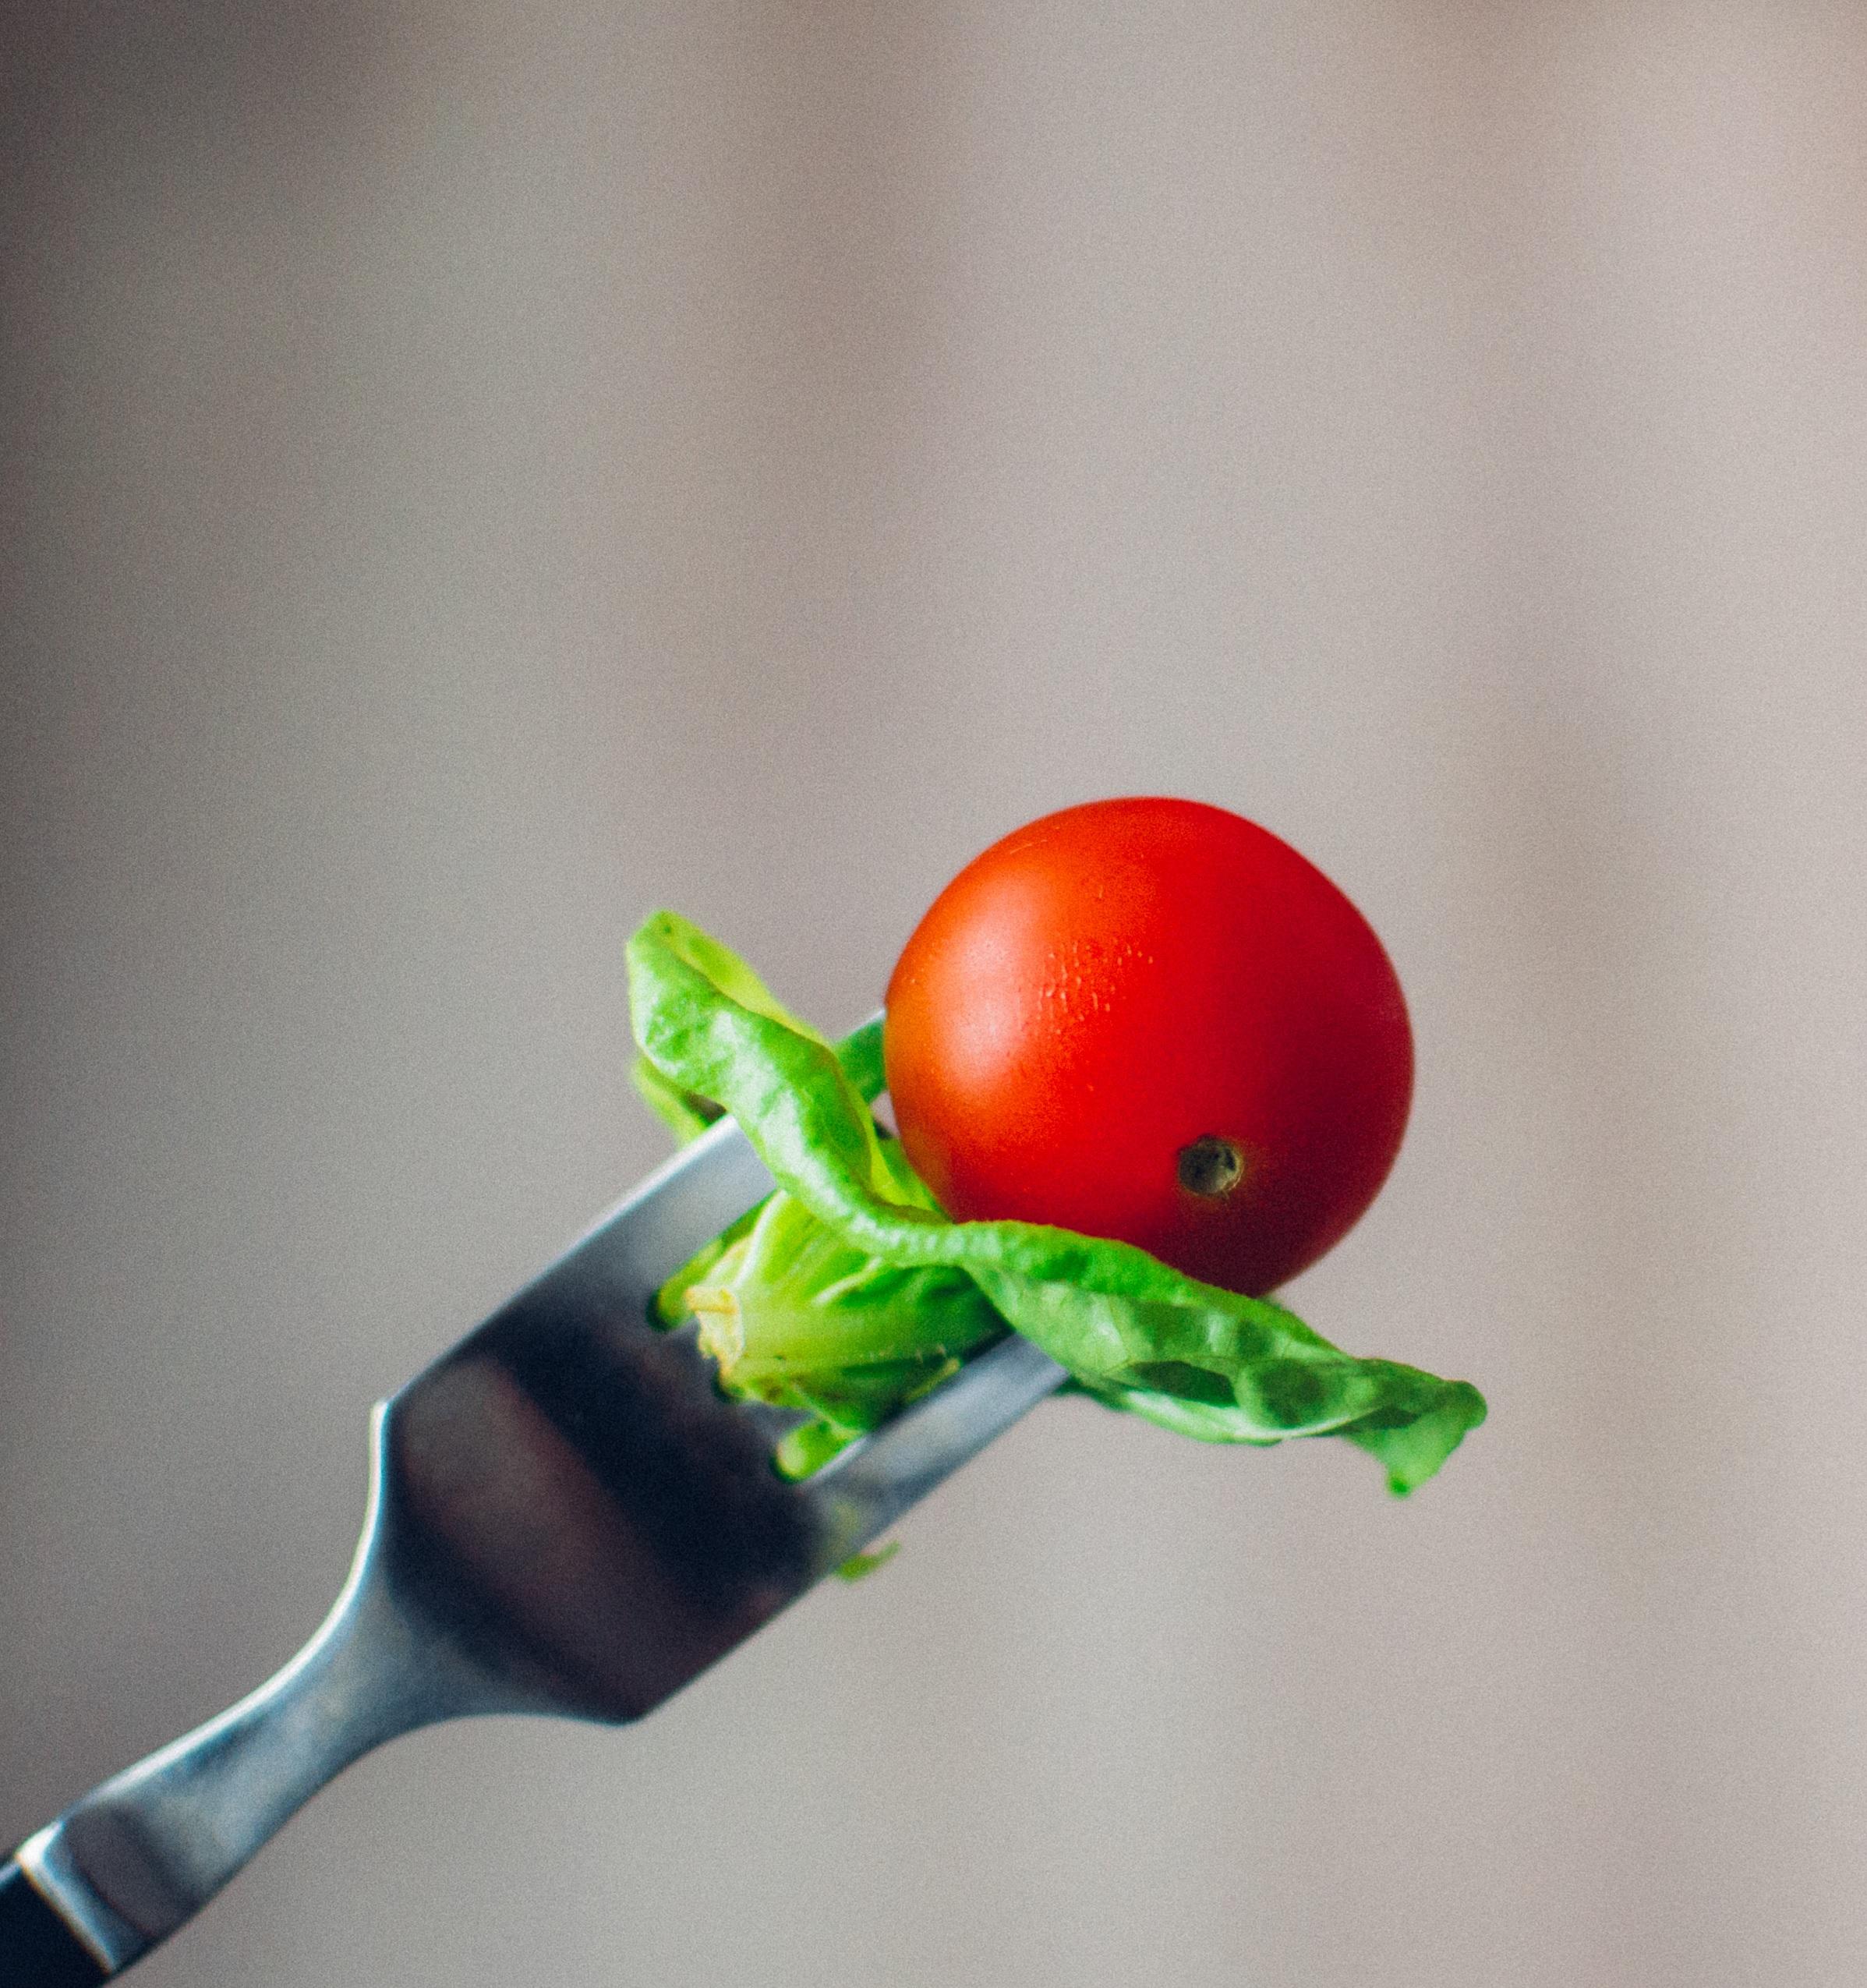 Ipertensione e alimentazione: diete vegetariane